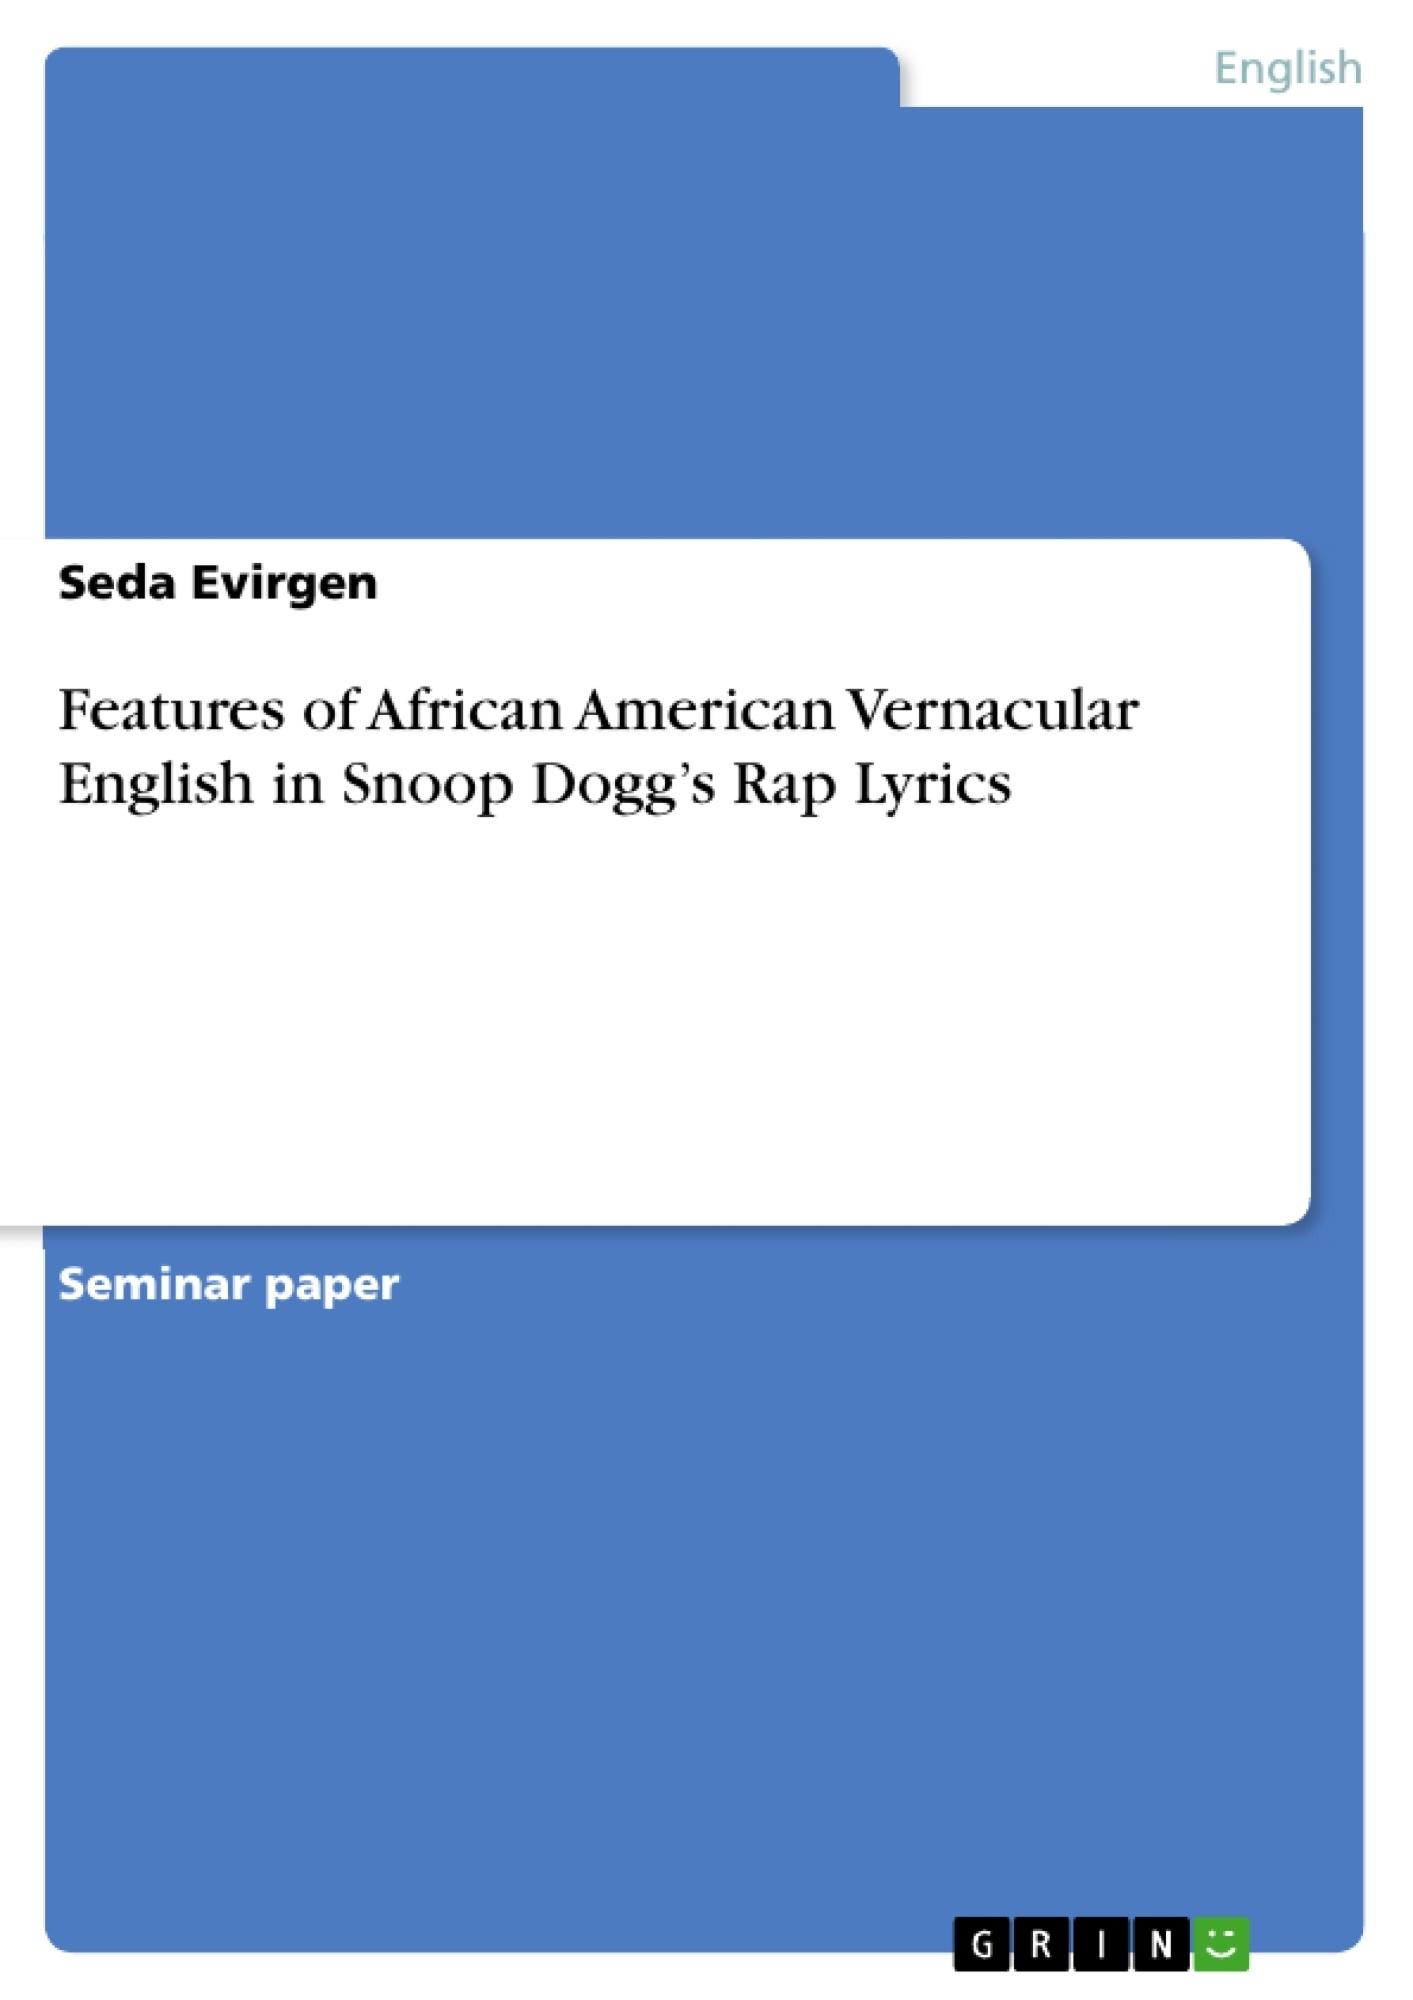 Title: Features of African American Vernacular English  in Snoop Dogg's Rap Lyrics